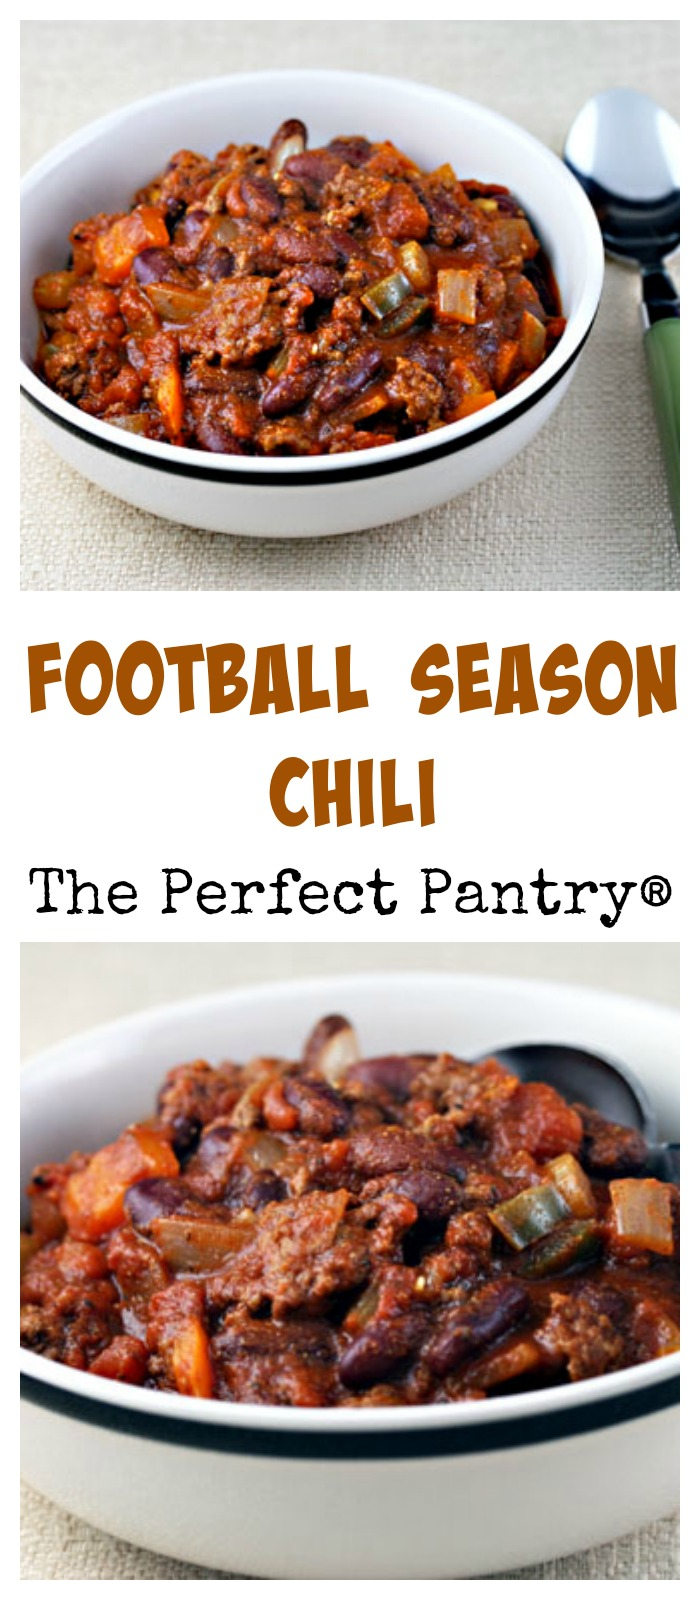 Football season chili, from an old Boston restaurant.